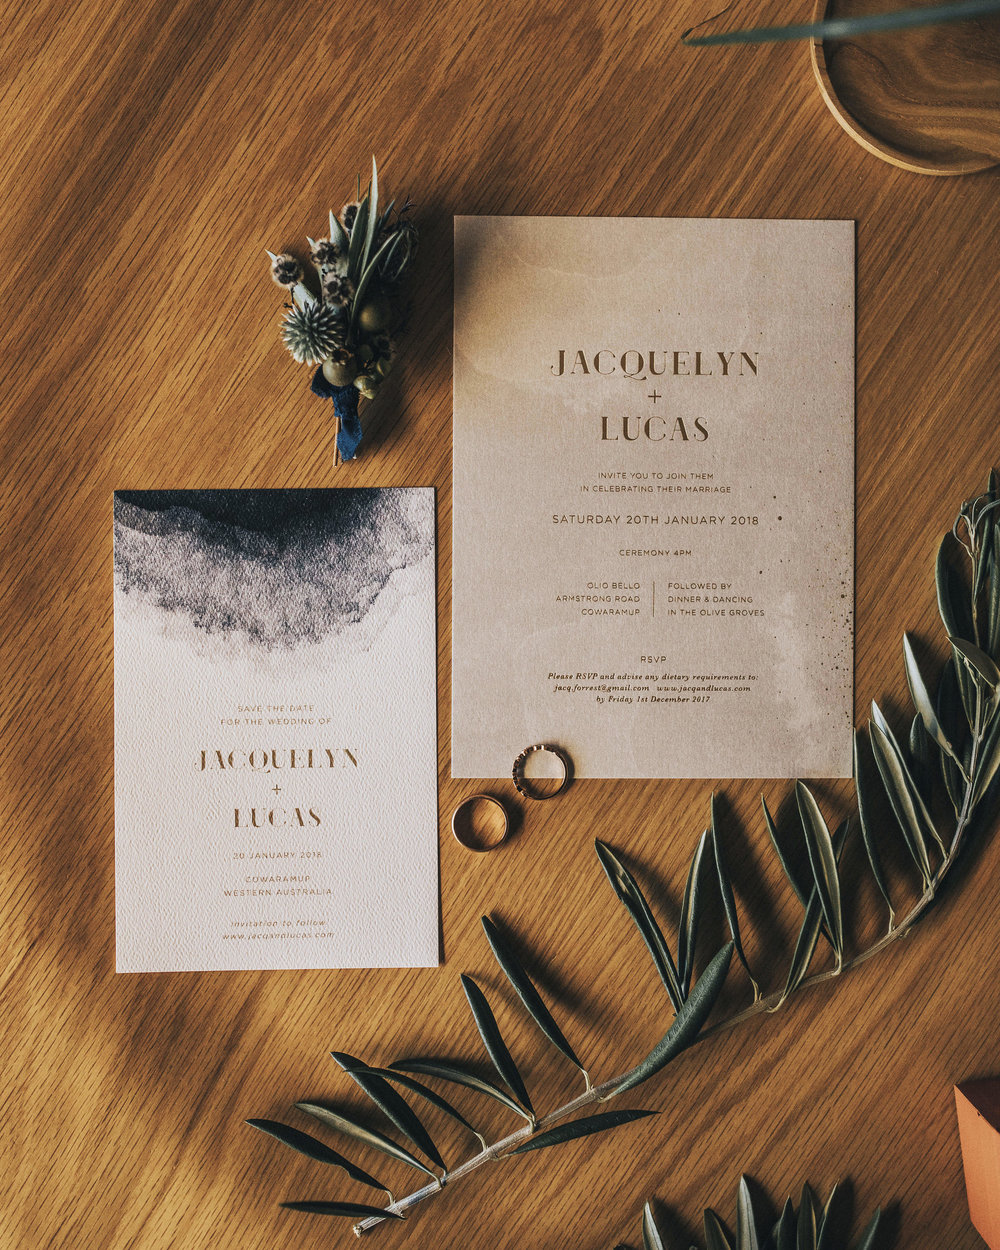 jacqs+lucas_ocean_harvest_01.JPG